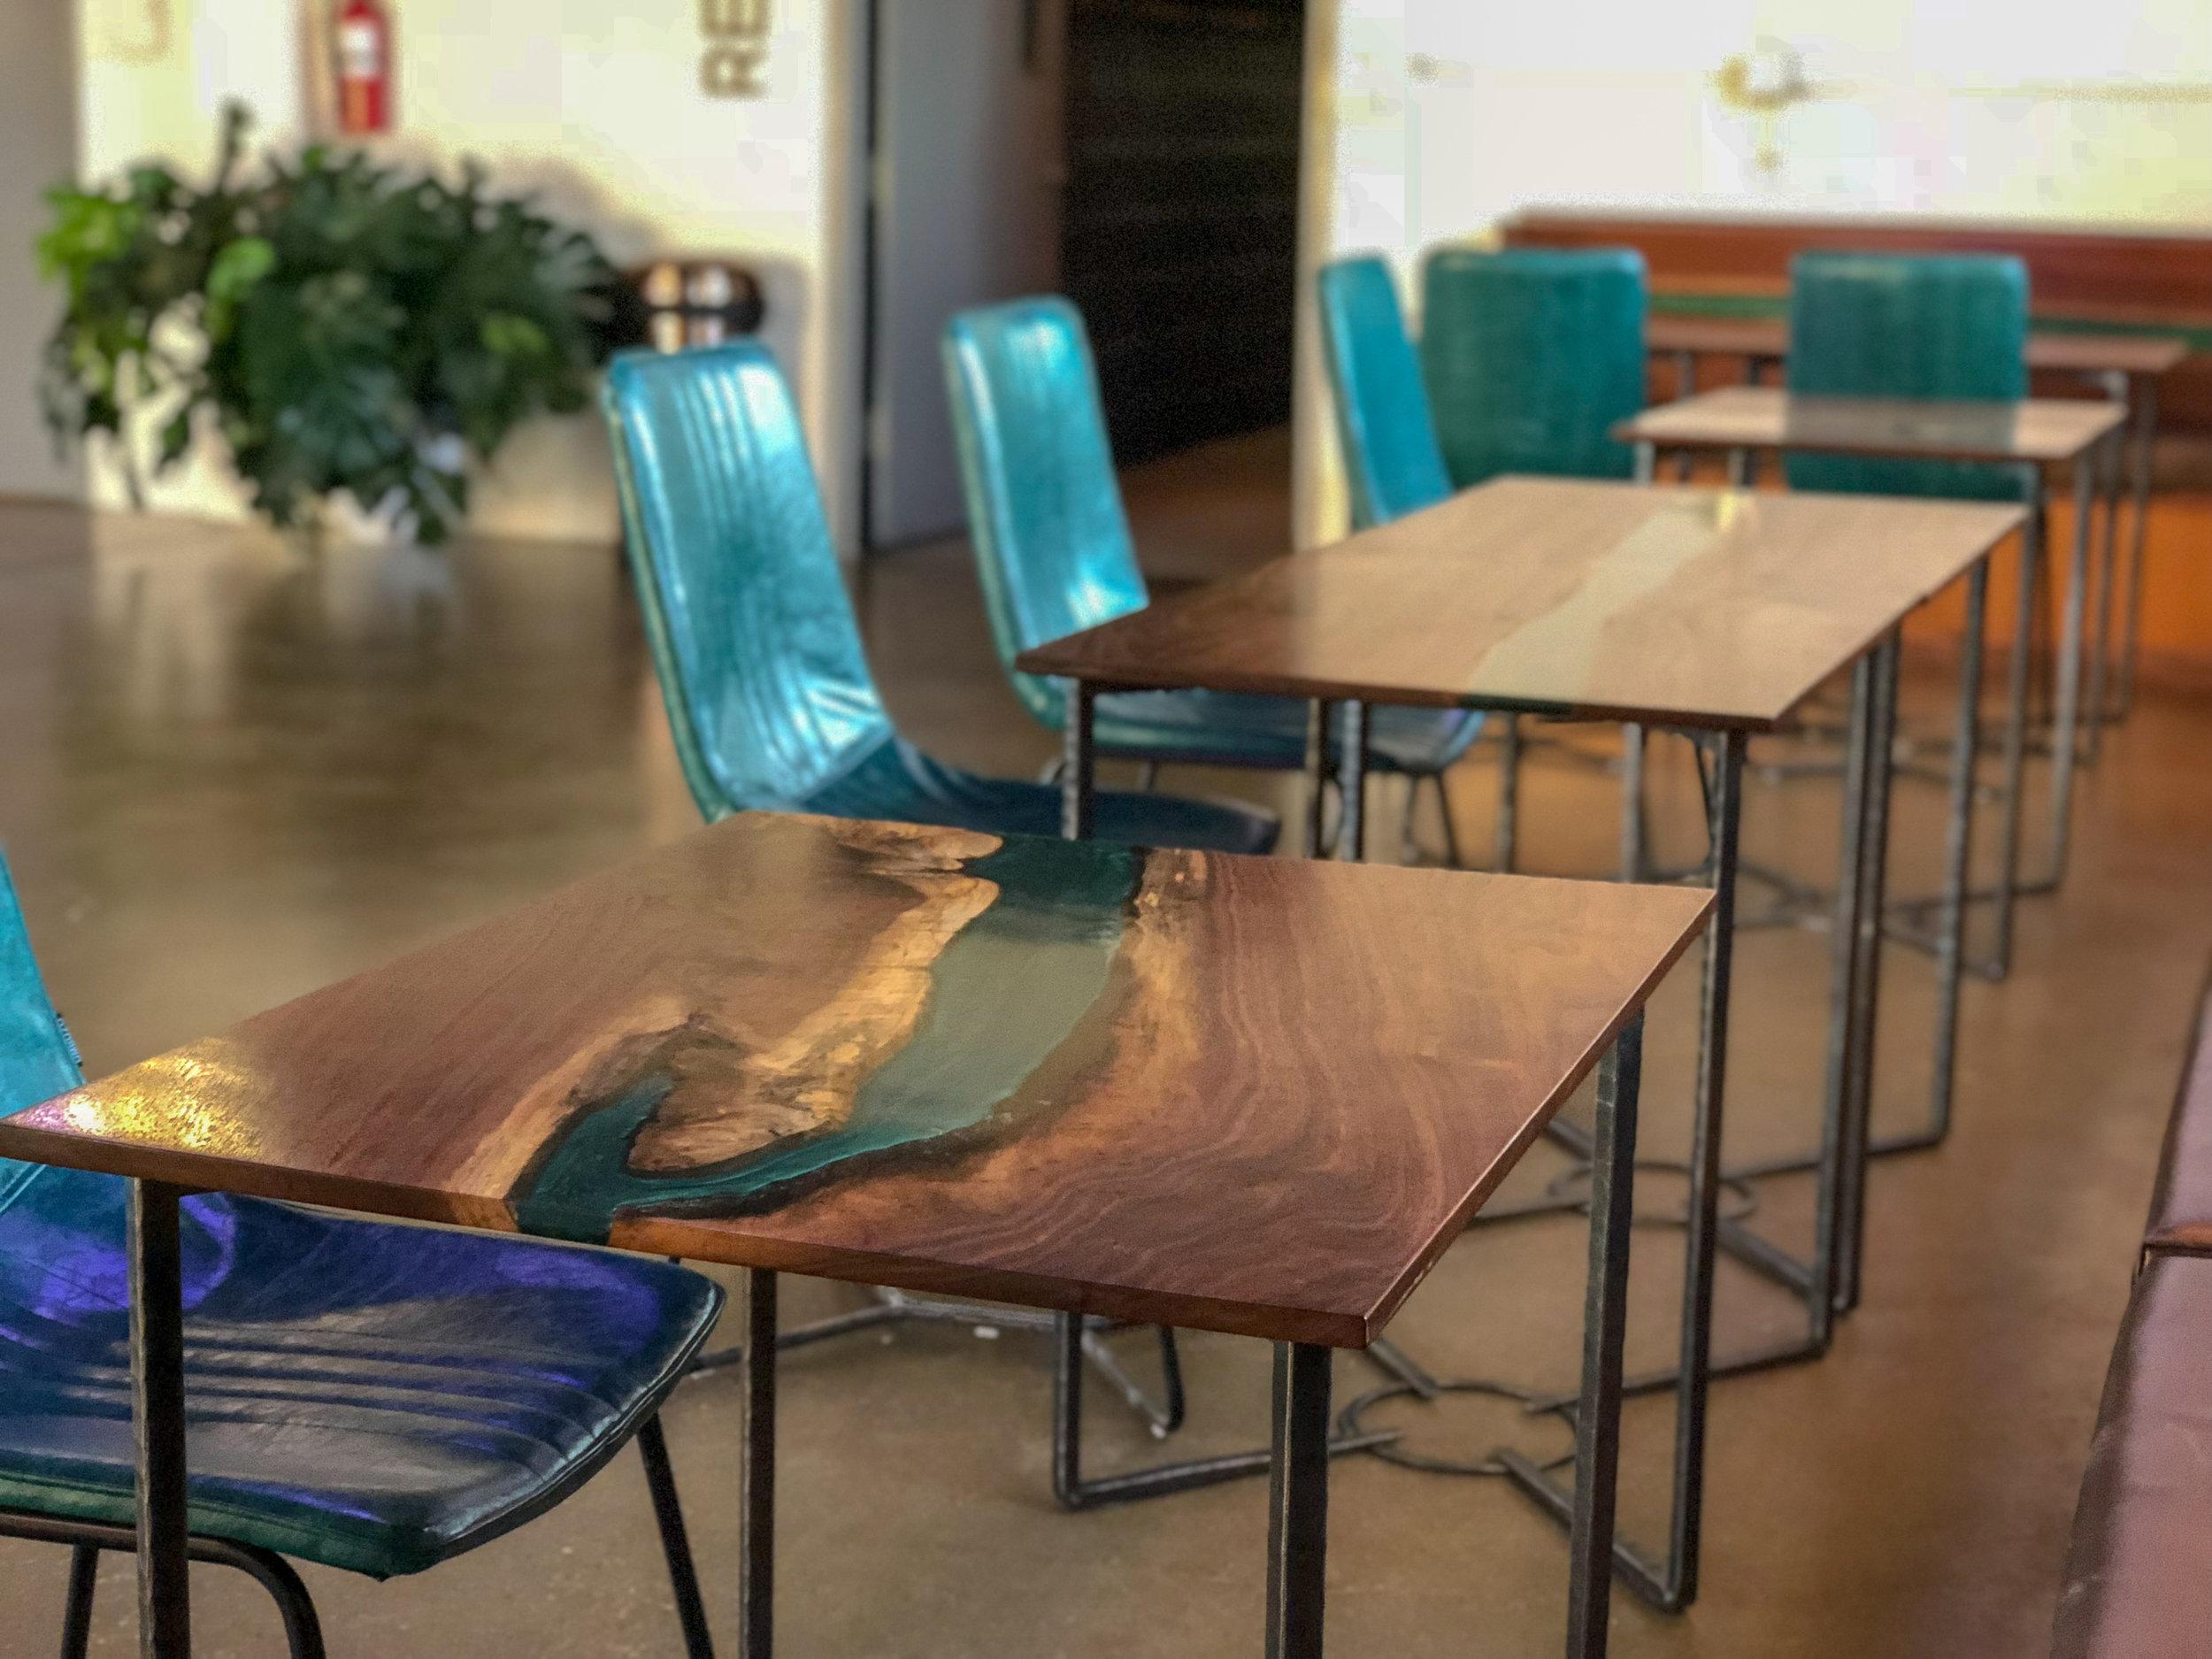 River Table Live Edge Tabol brewing Sallie Plumley Studio Richmond Virginia Sally Plumley Custom Woodworking and Furniture Design